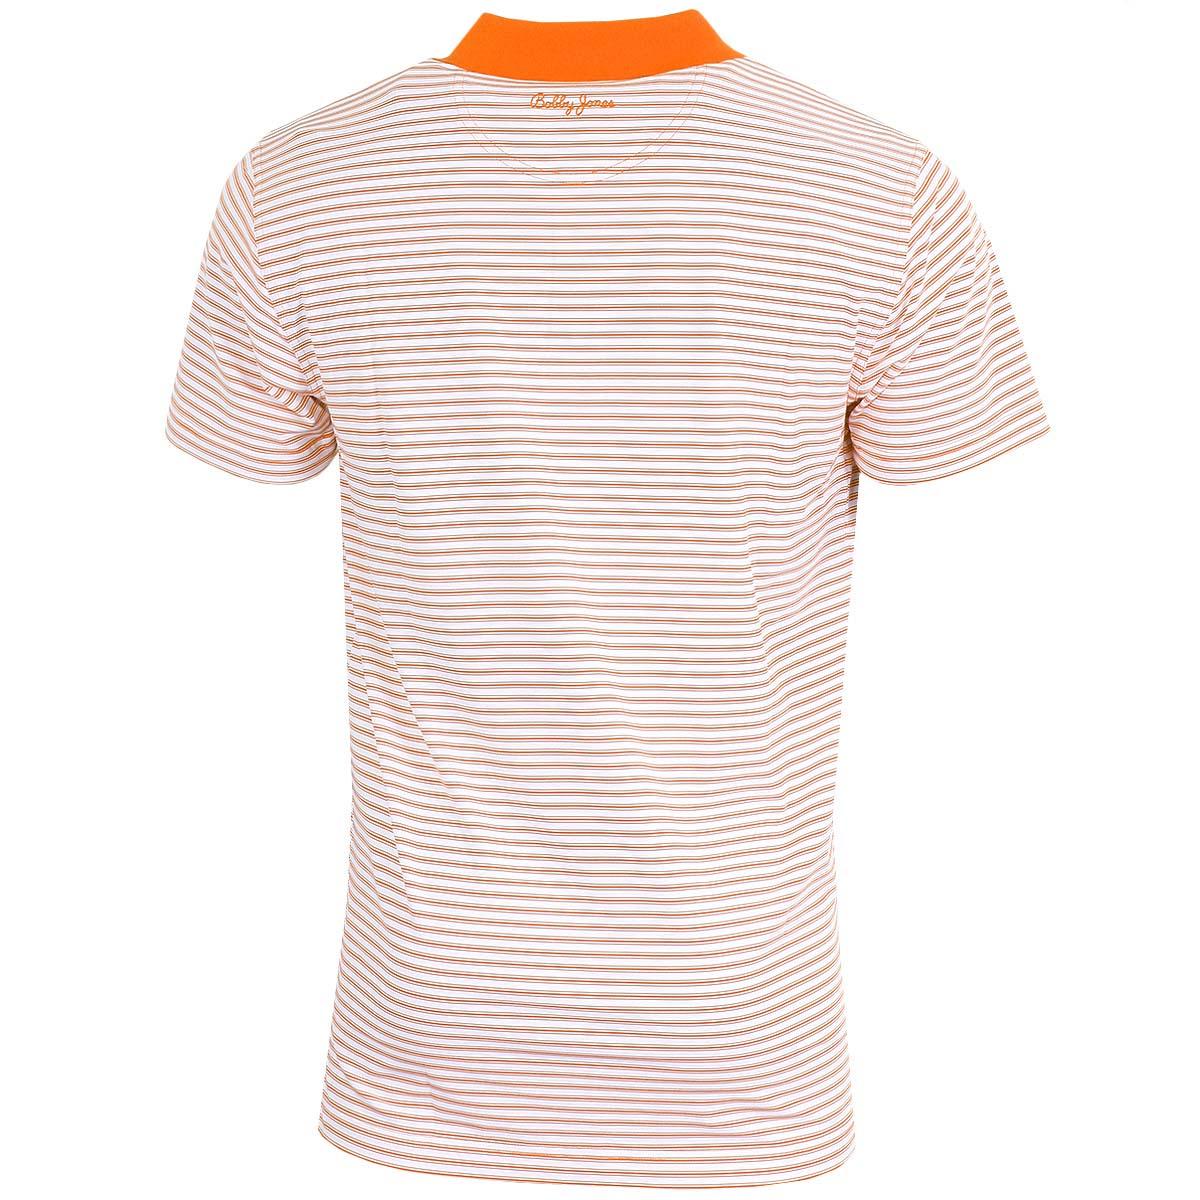 Bobby-Jones-Mens-XH20-Frame-Stripe-European-Fit-Golf-Polo-Shirt-72-OFF-RRP thumbnail 15